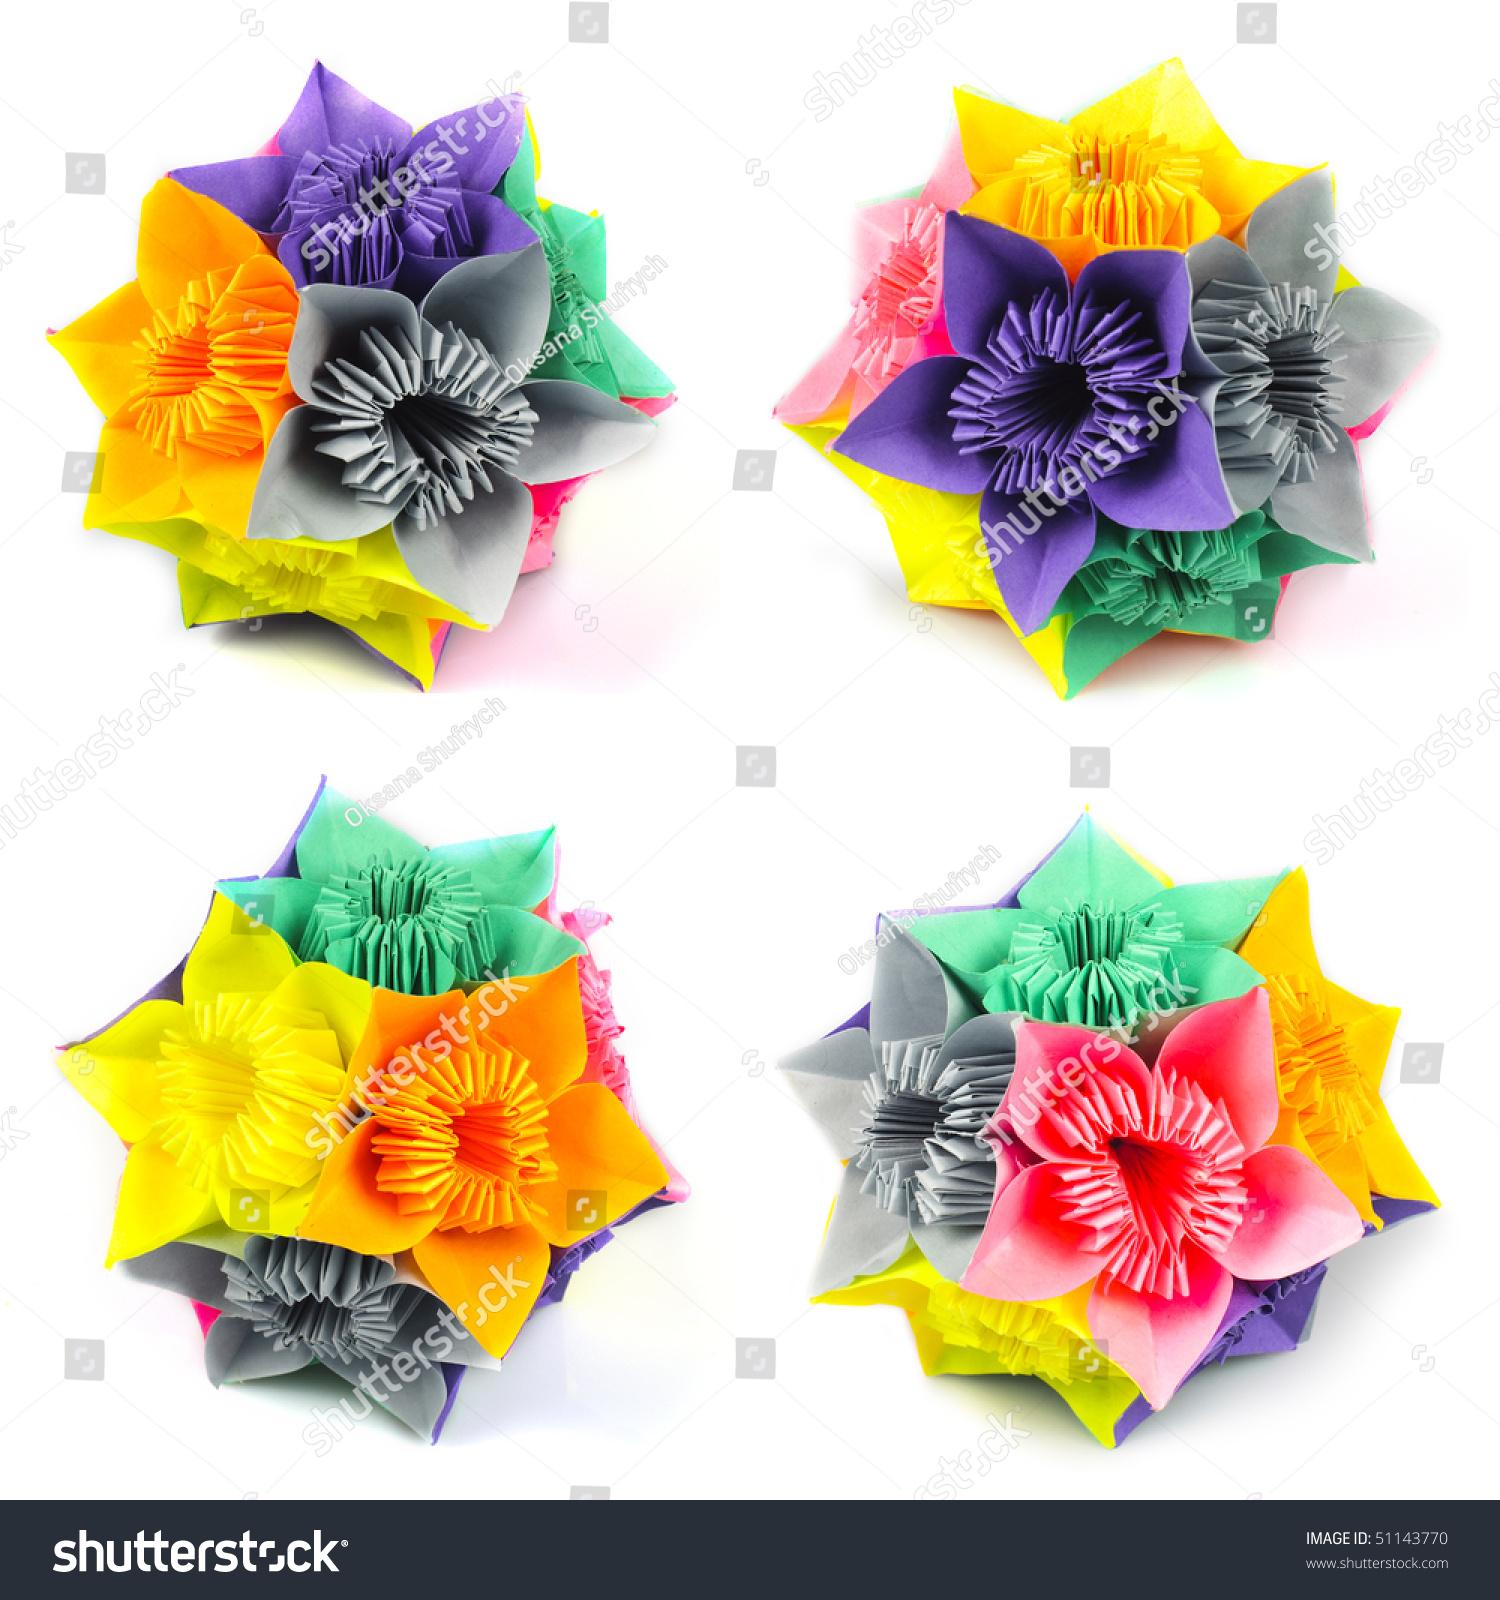 Colorfull origami kusudama rainbow flowers isolated stock photo colorfull origami kusudama from rainbow flowers isolated on white view from four angles jeuxipadfo Gallery